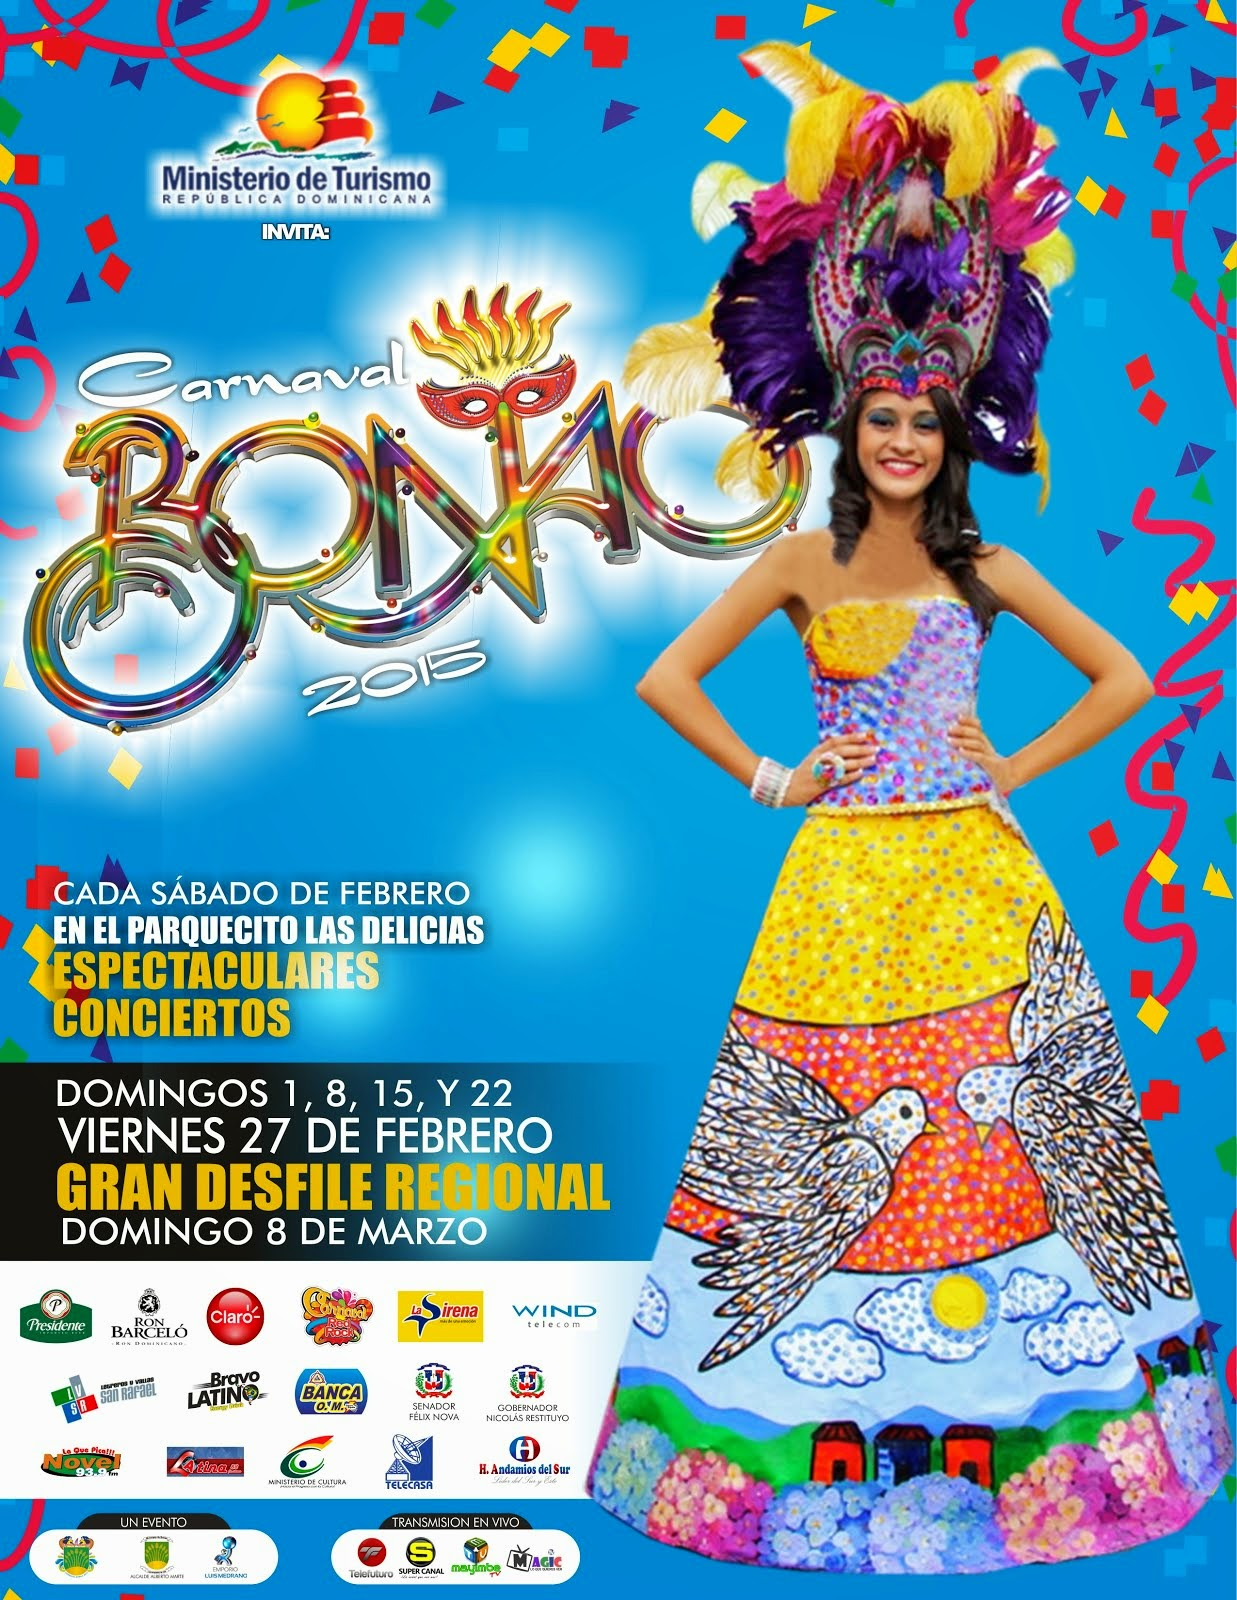 Carnaval de Bonao